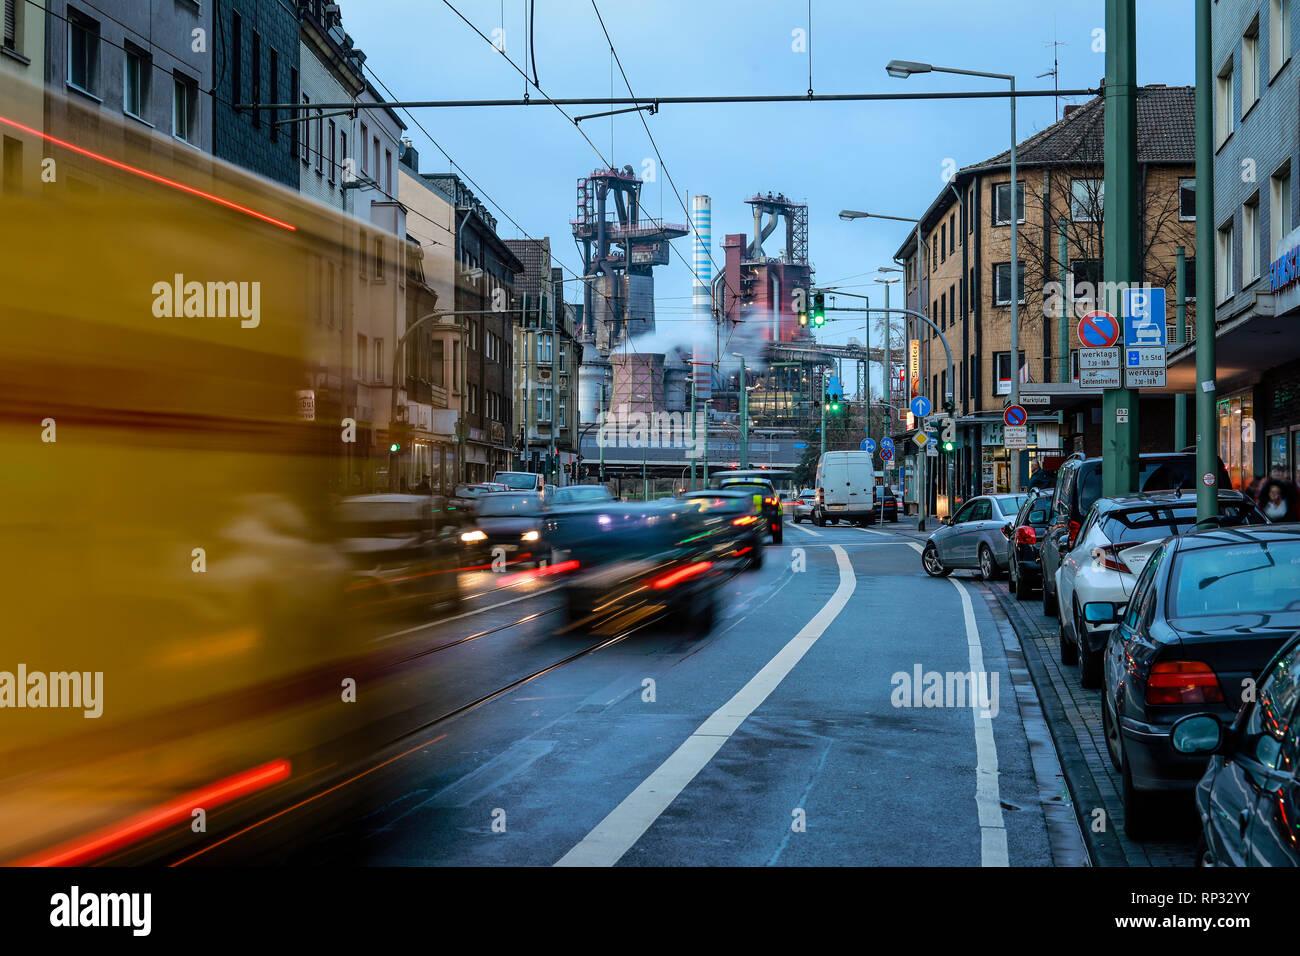 08.01.2019, Duisburg, North Rhine-Westphalia, Germany - City view with the ThyssenKrupp Huettenwerk in Duisburg-Bruckhausen, Bruckhausen is a district - Stock Image